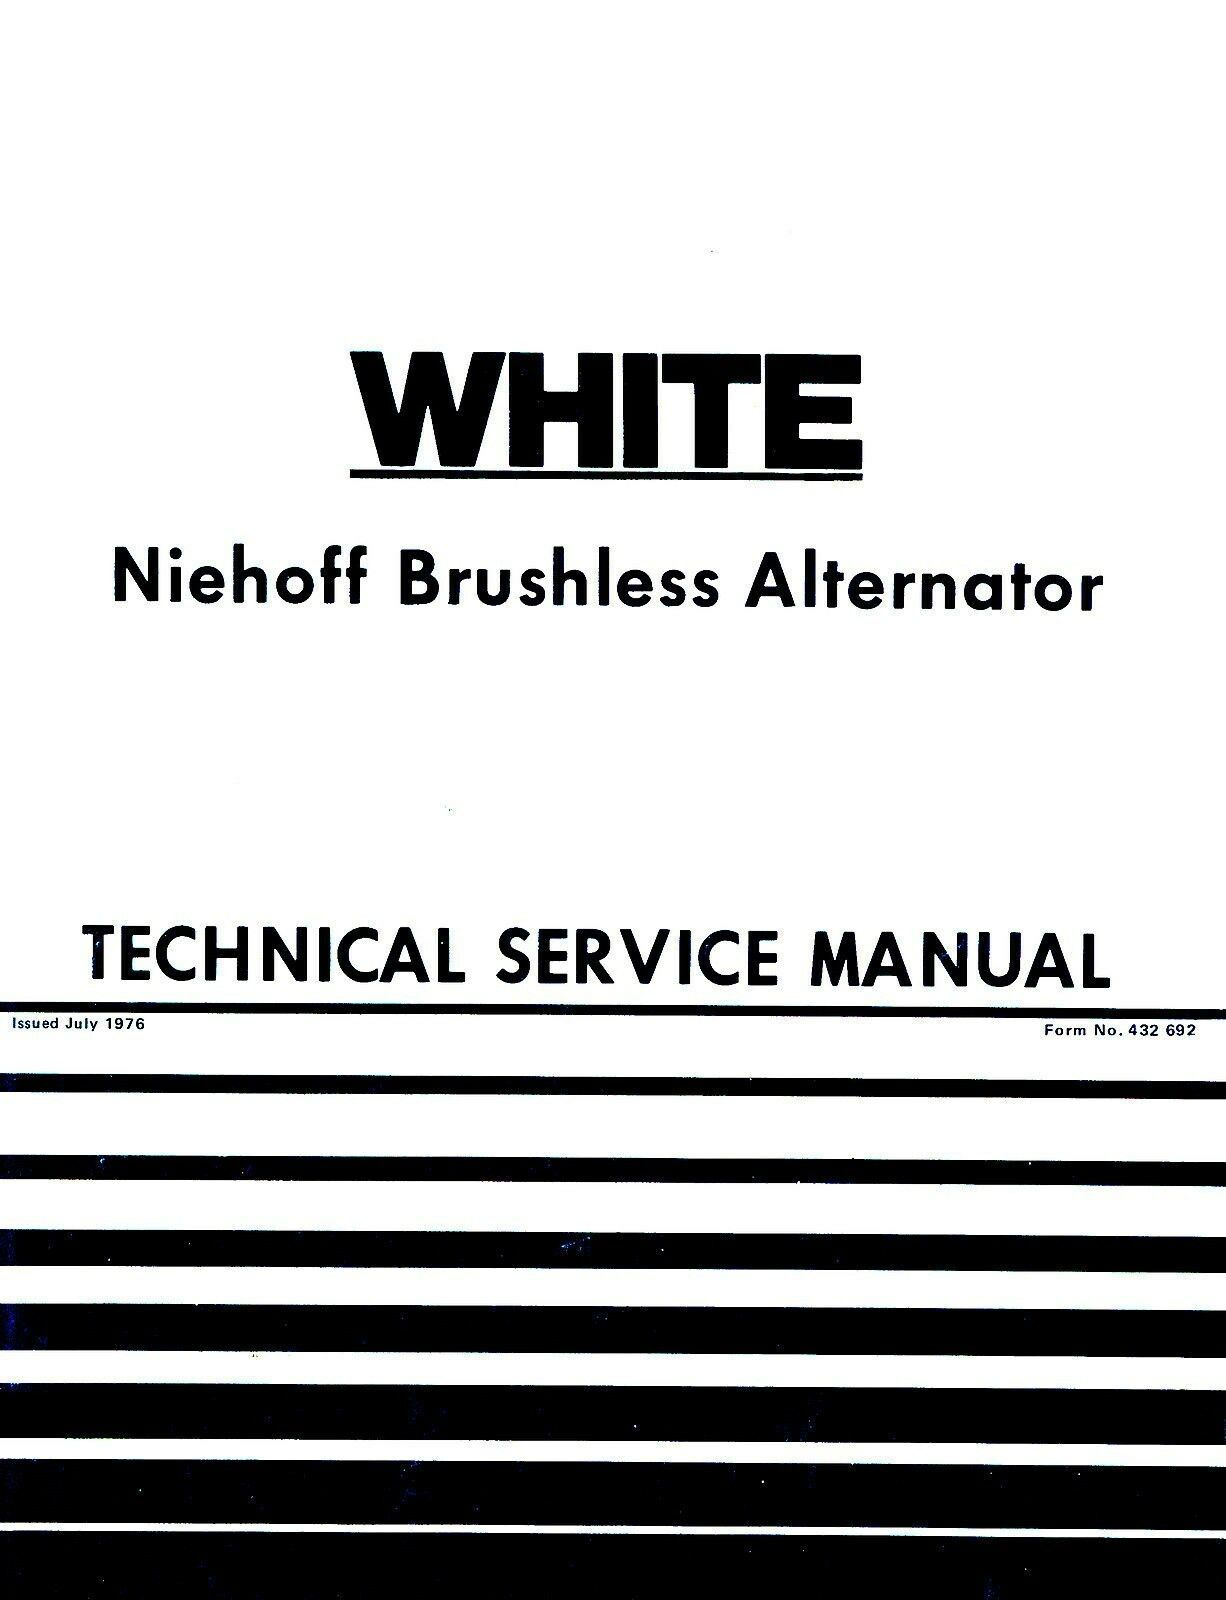 oliver white niehoff brushless alternator tractor service manual ol rh ebay com Power Max Heavy Duty Alternator Heavy Duty Truck Batteries